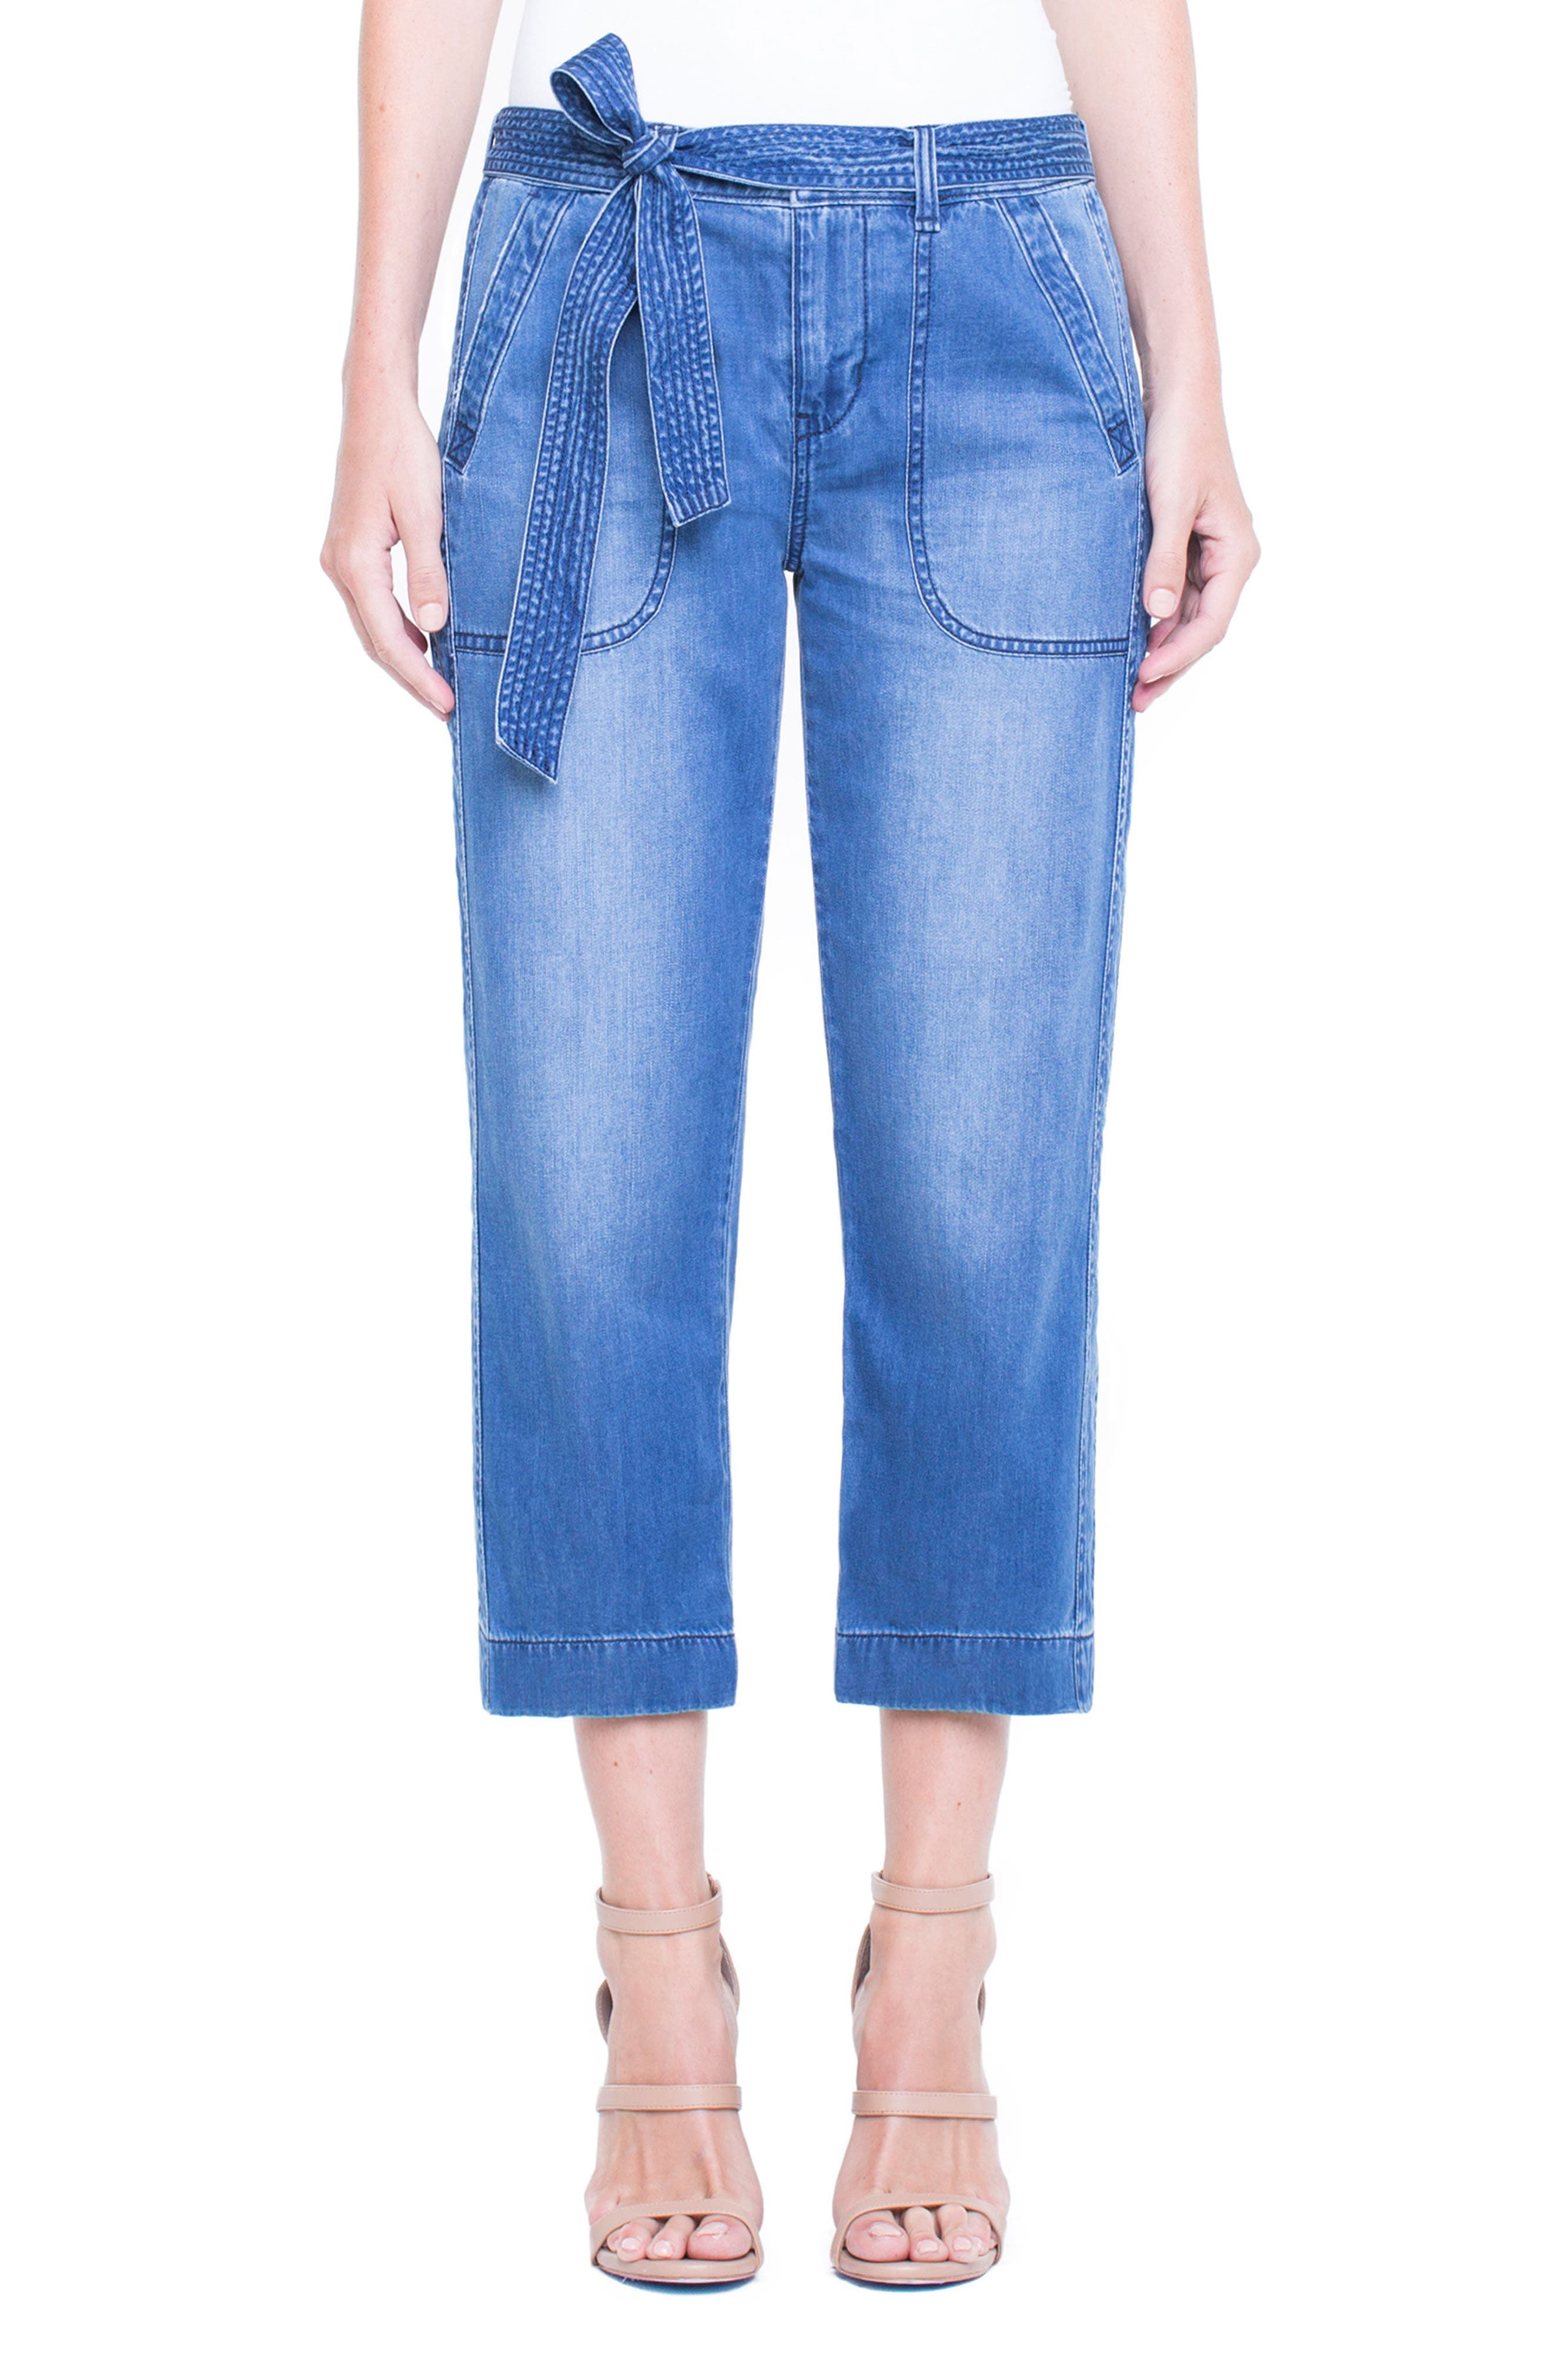 Norah Capri Jeans,                             Main thumbnail 1, color,                             408